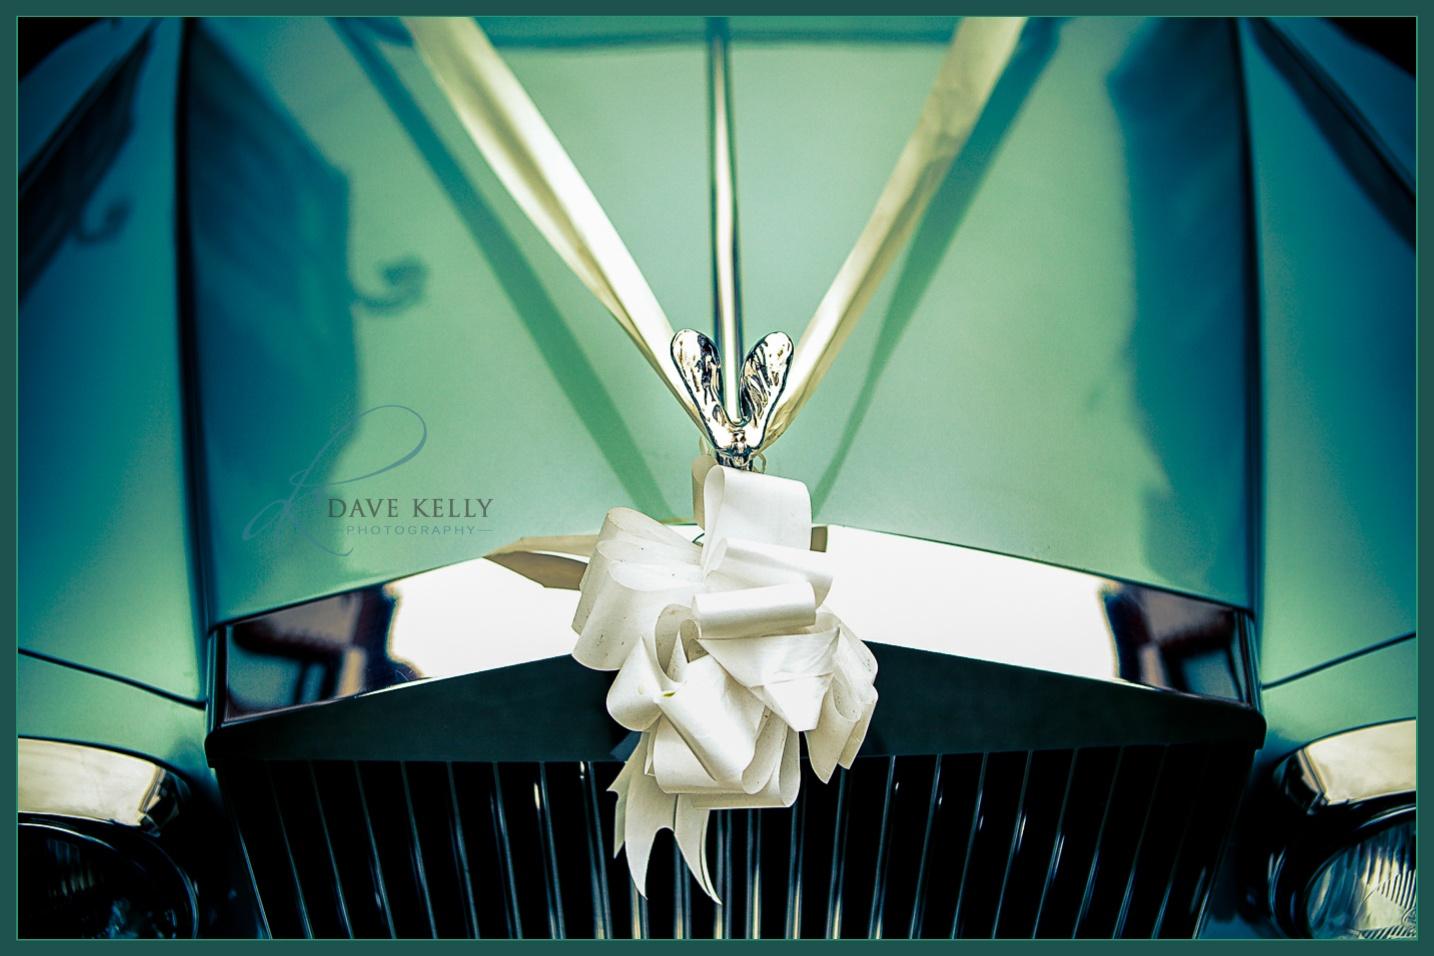 The Wedding Car by Dave Kelly